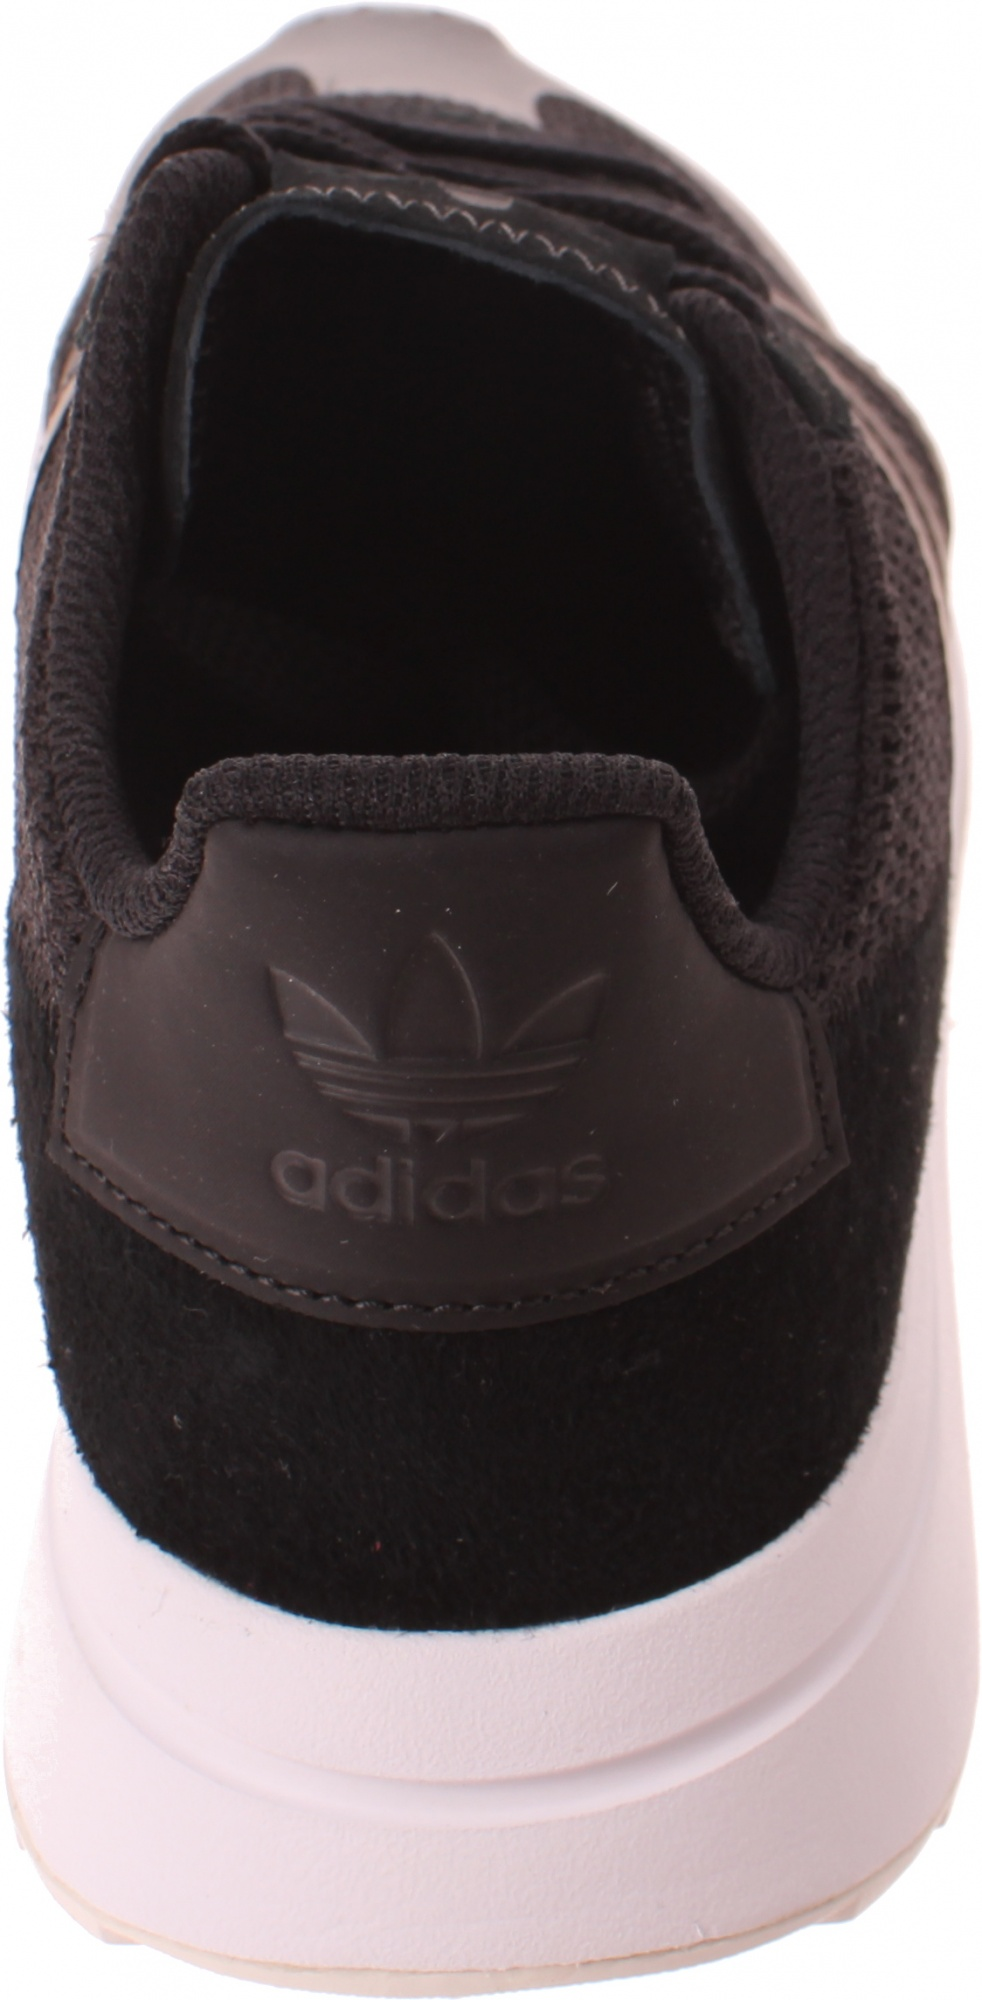 9c1608bf934 adidas sneakers Flashback dames zwart - Internet-Sport&Casuals